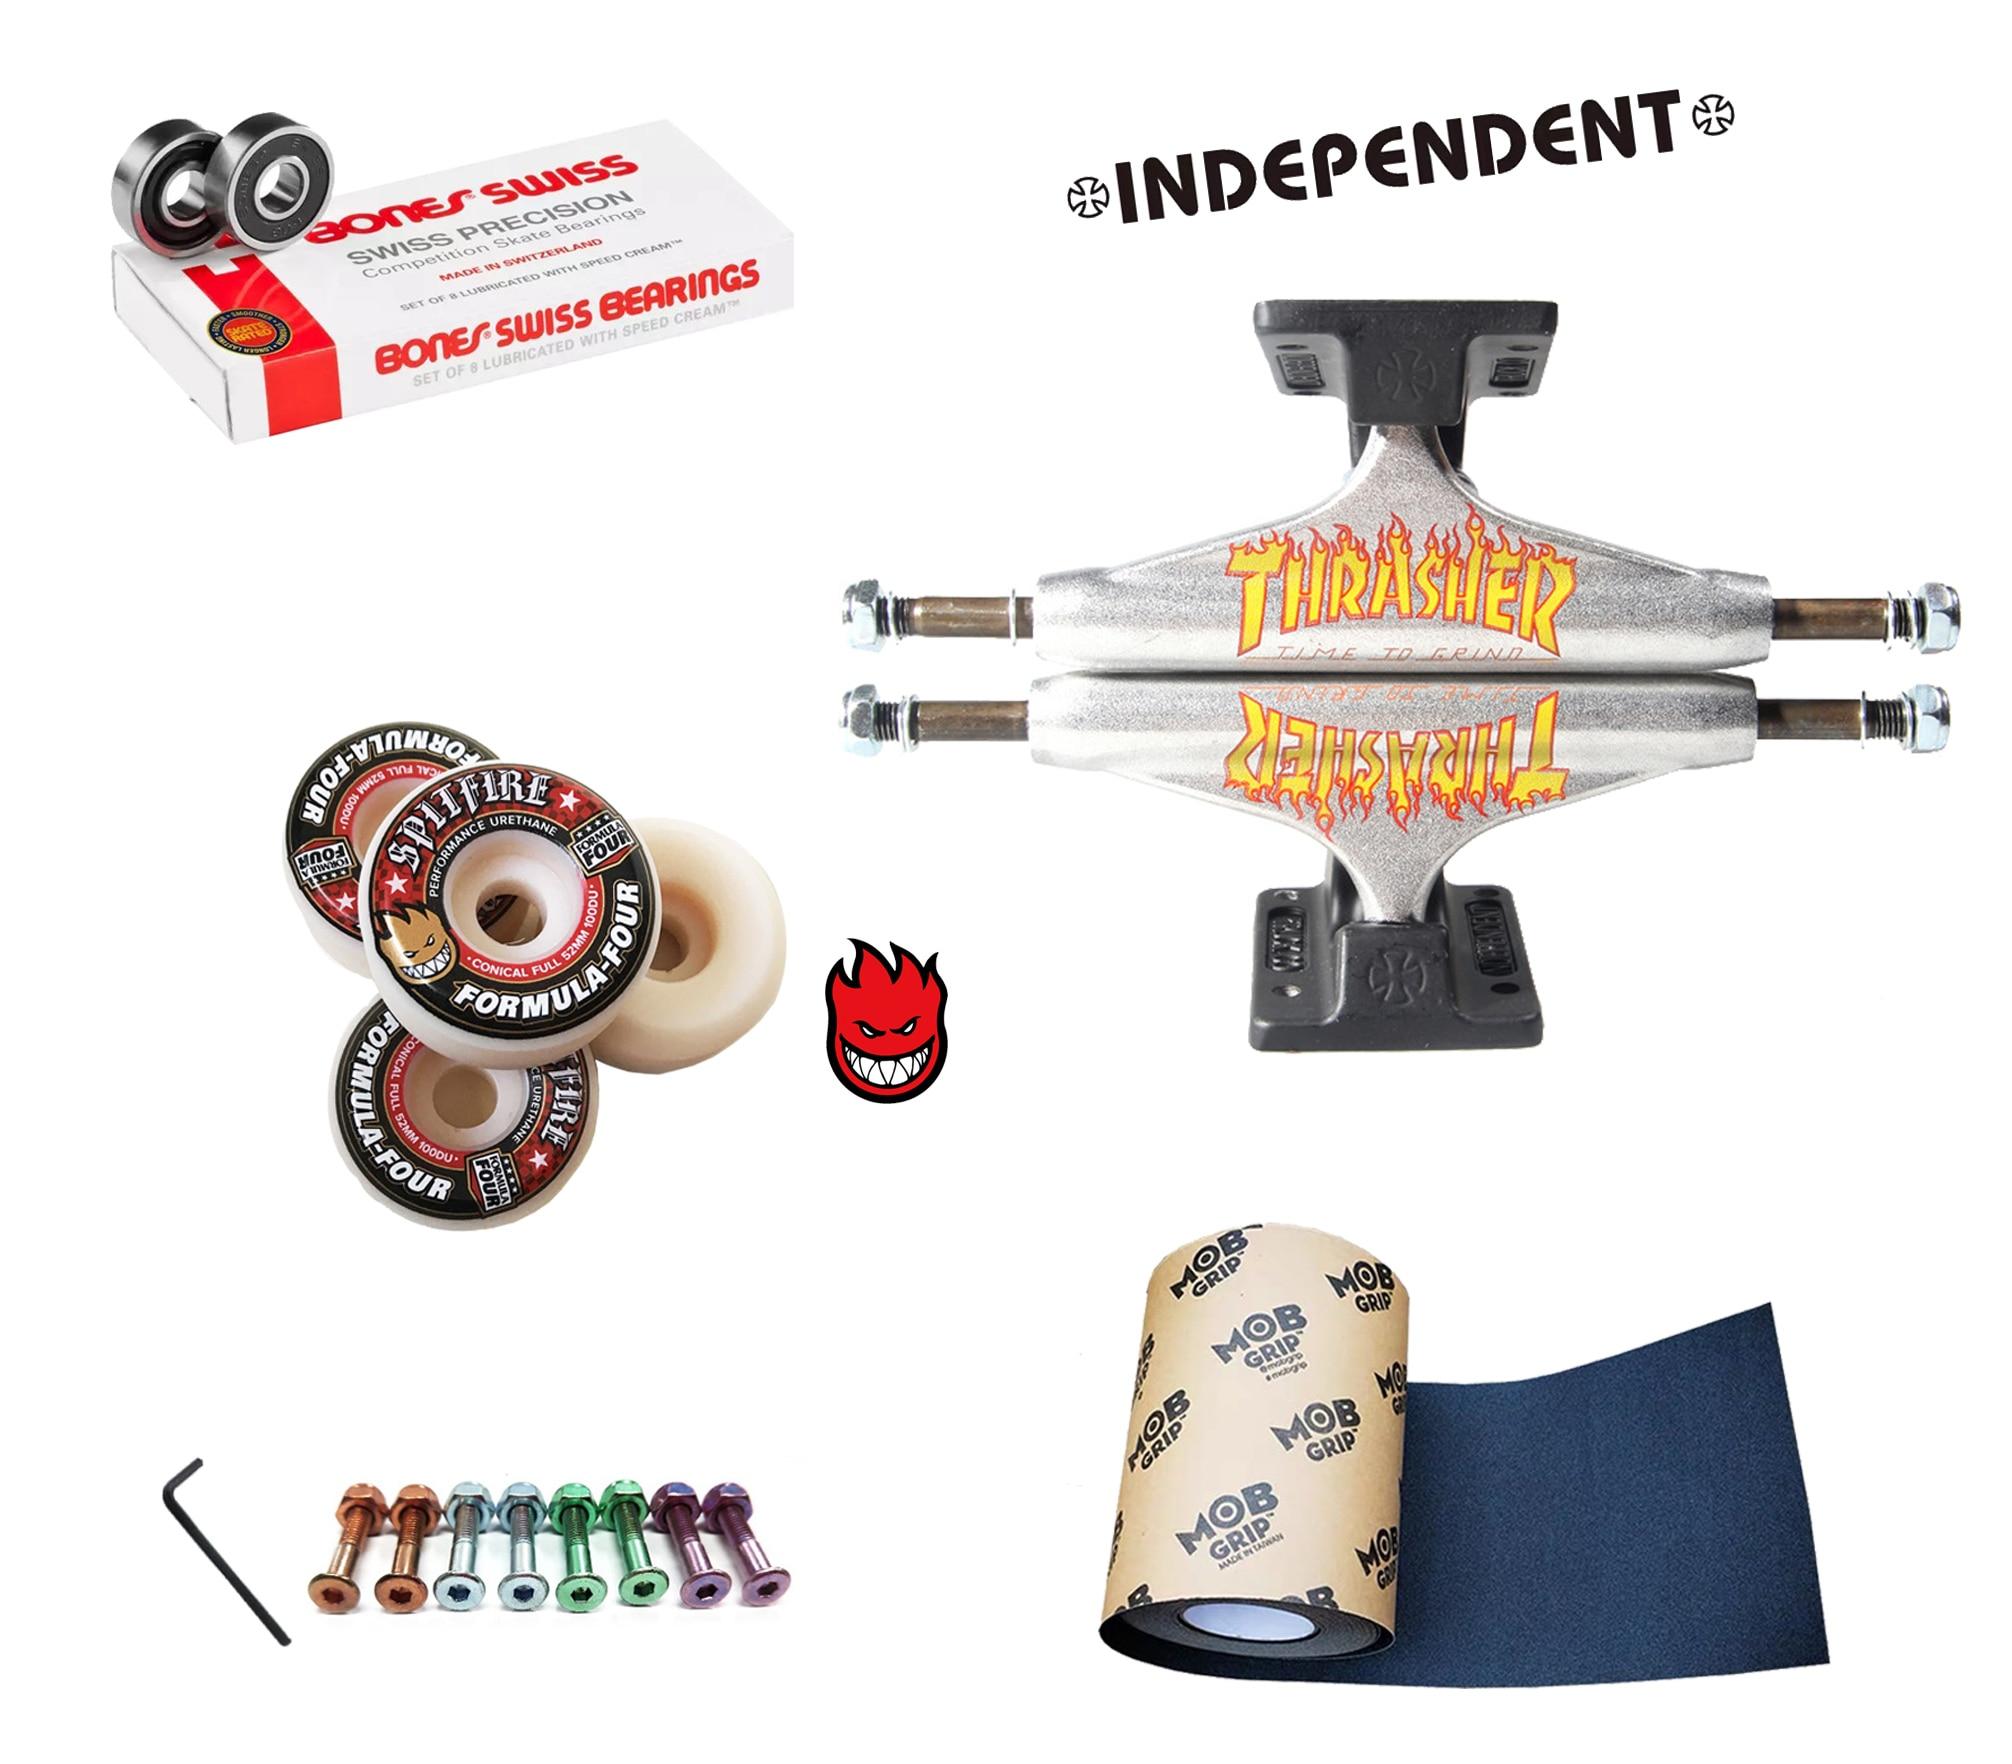 Monopatín indexable, camisetas spitfire, ruedas de monopatín, buenos rodamientos genuinos, MOB grip cinta de nivel profesional